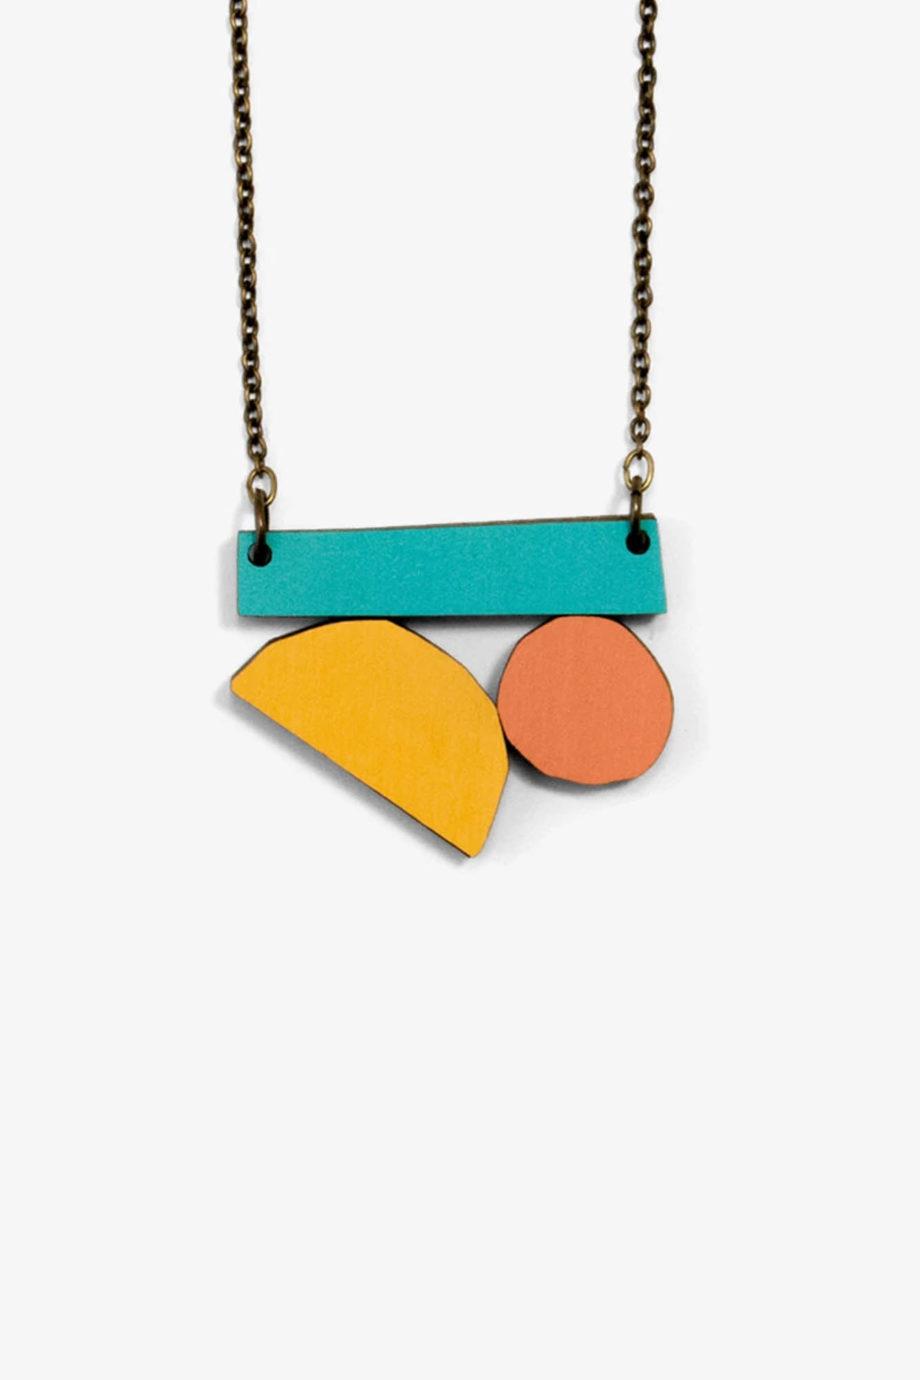 materia-rica-collar-shape-#33